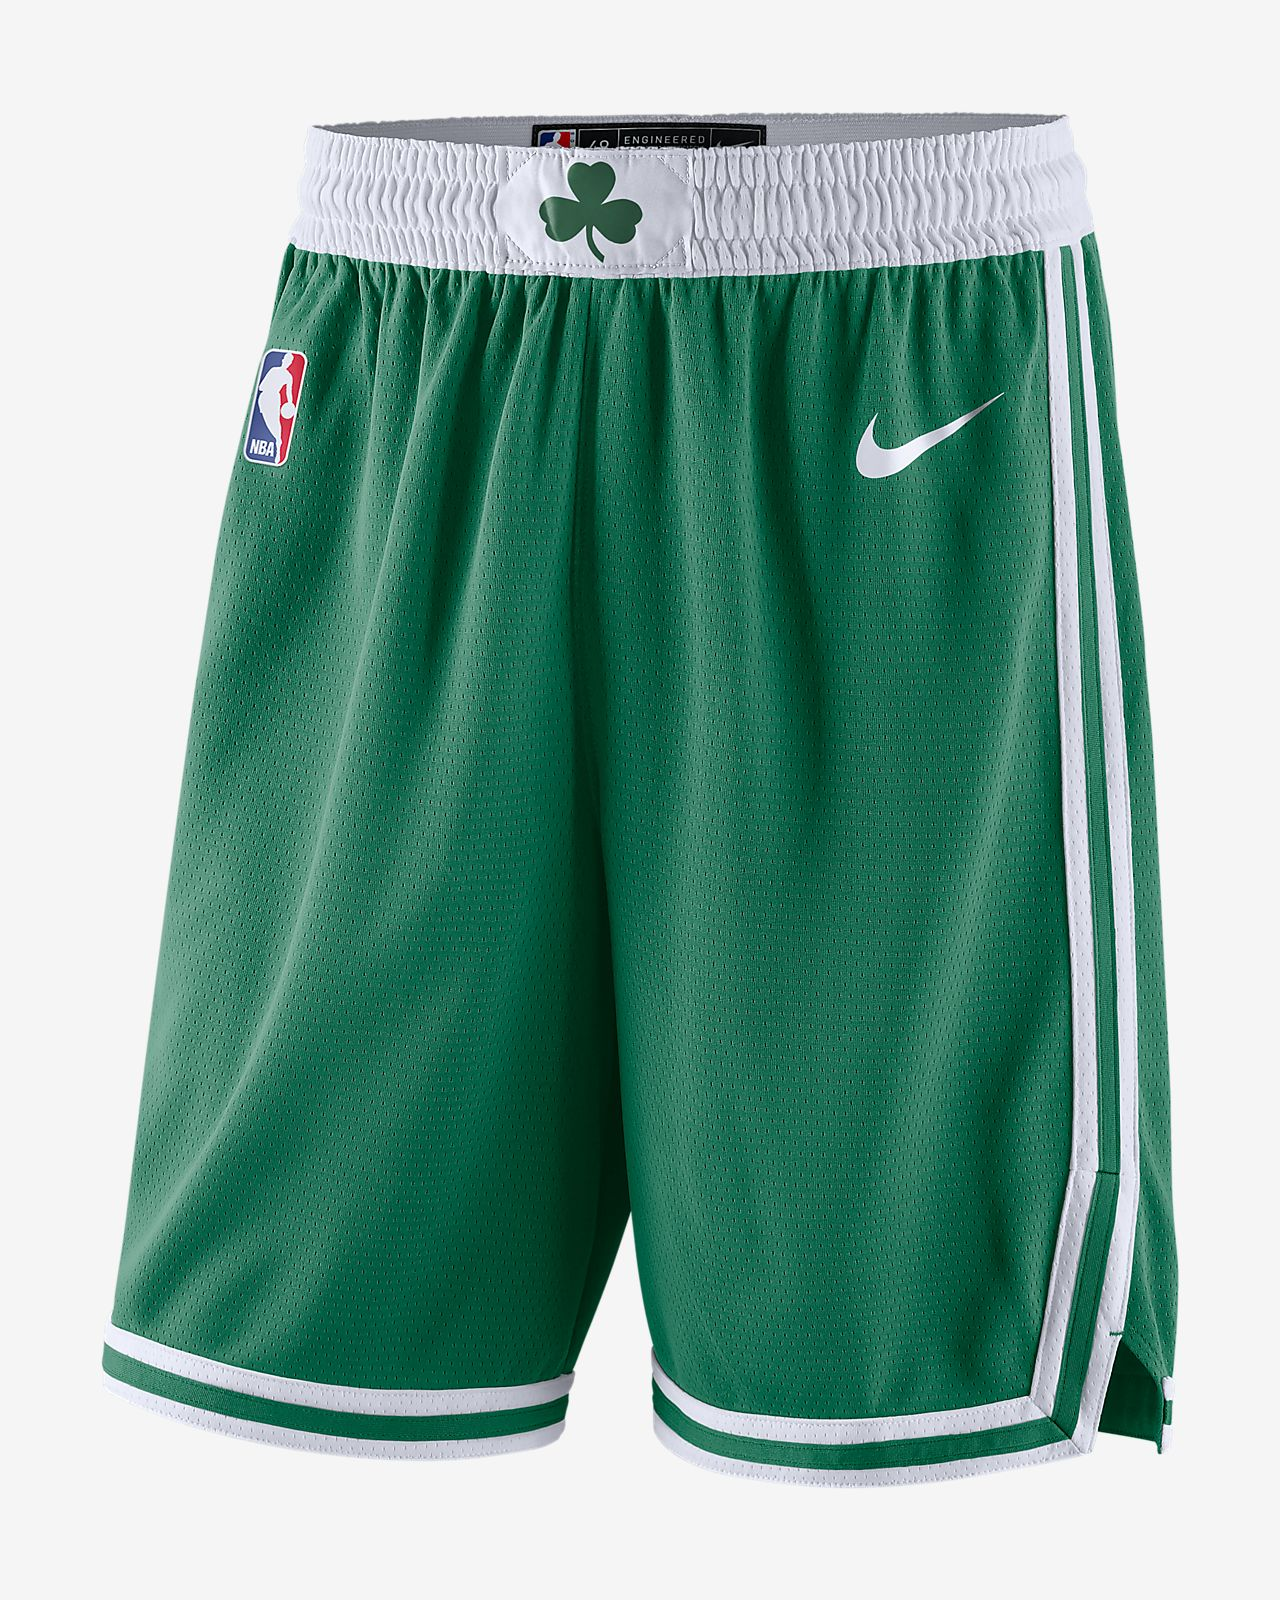 separation shoes a6a7d 5c3ef Boston Celtics Icon Edition Swingman Men's Nike NBA Shorts